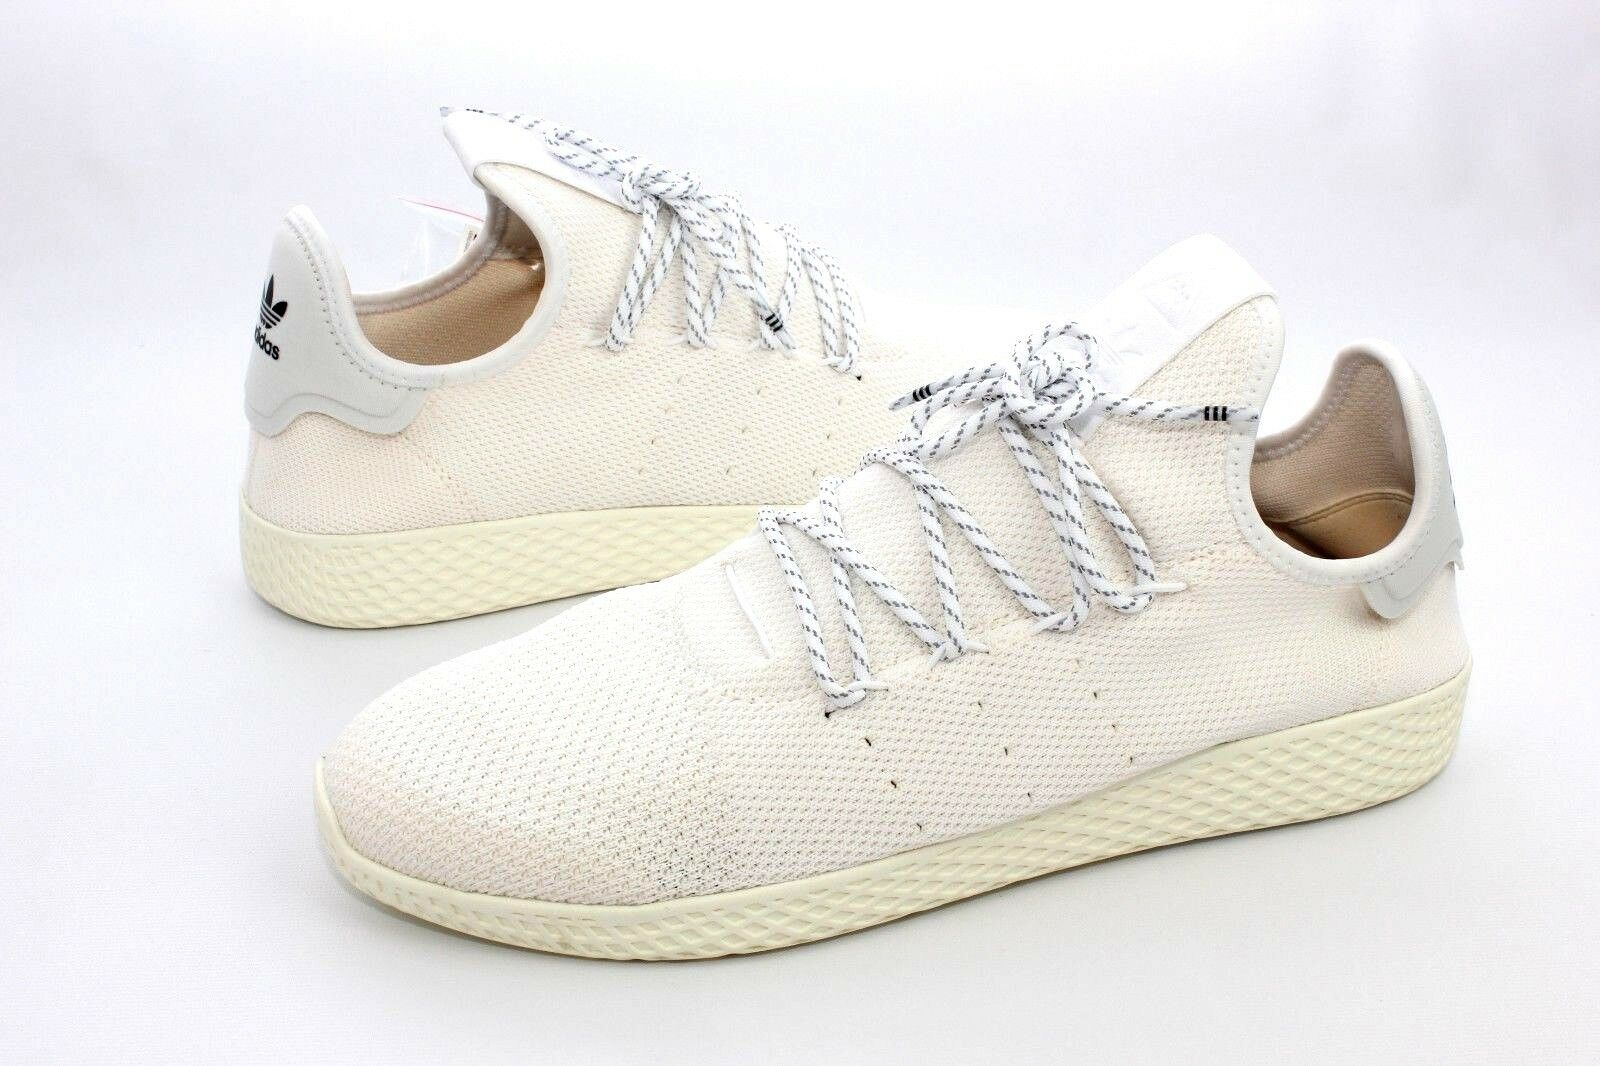 Adidas pharrell a.c. williams hu holi tennis a.c. pharrell crema / white Uomo taglia 11 da9613 660893